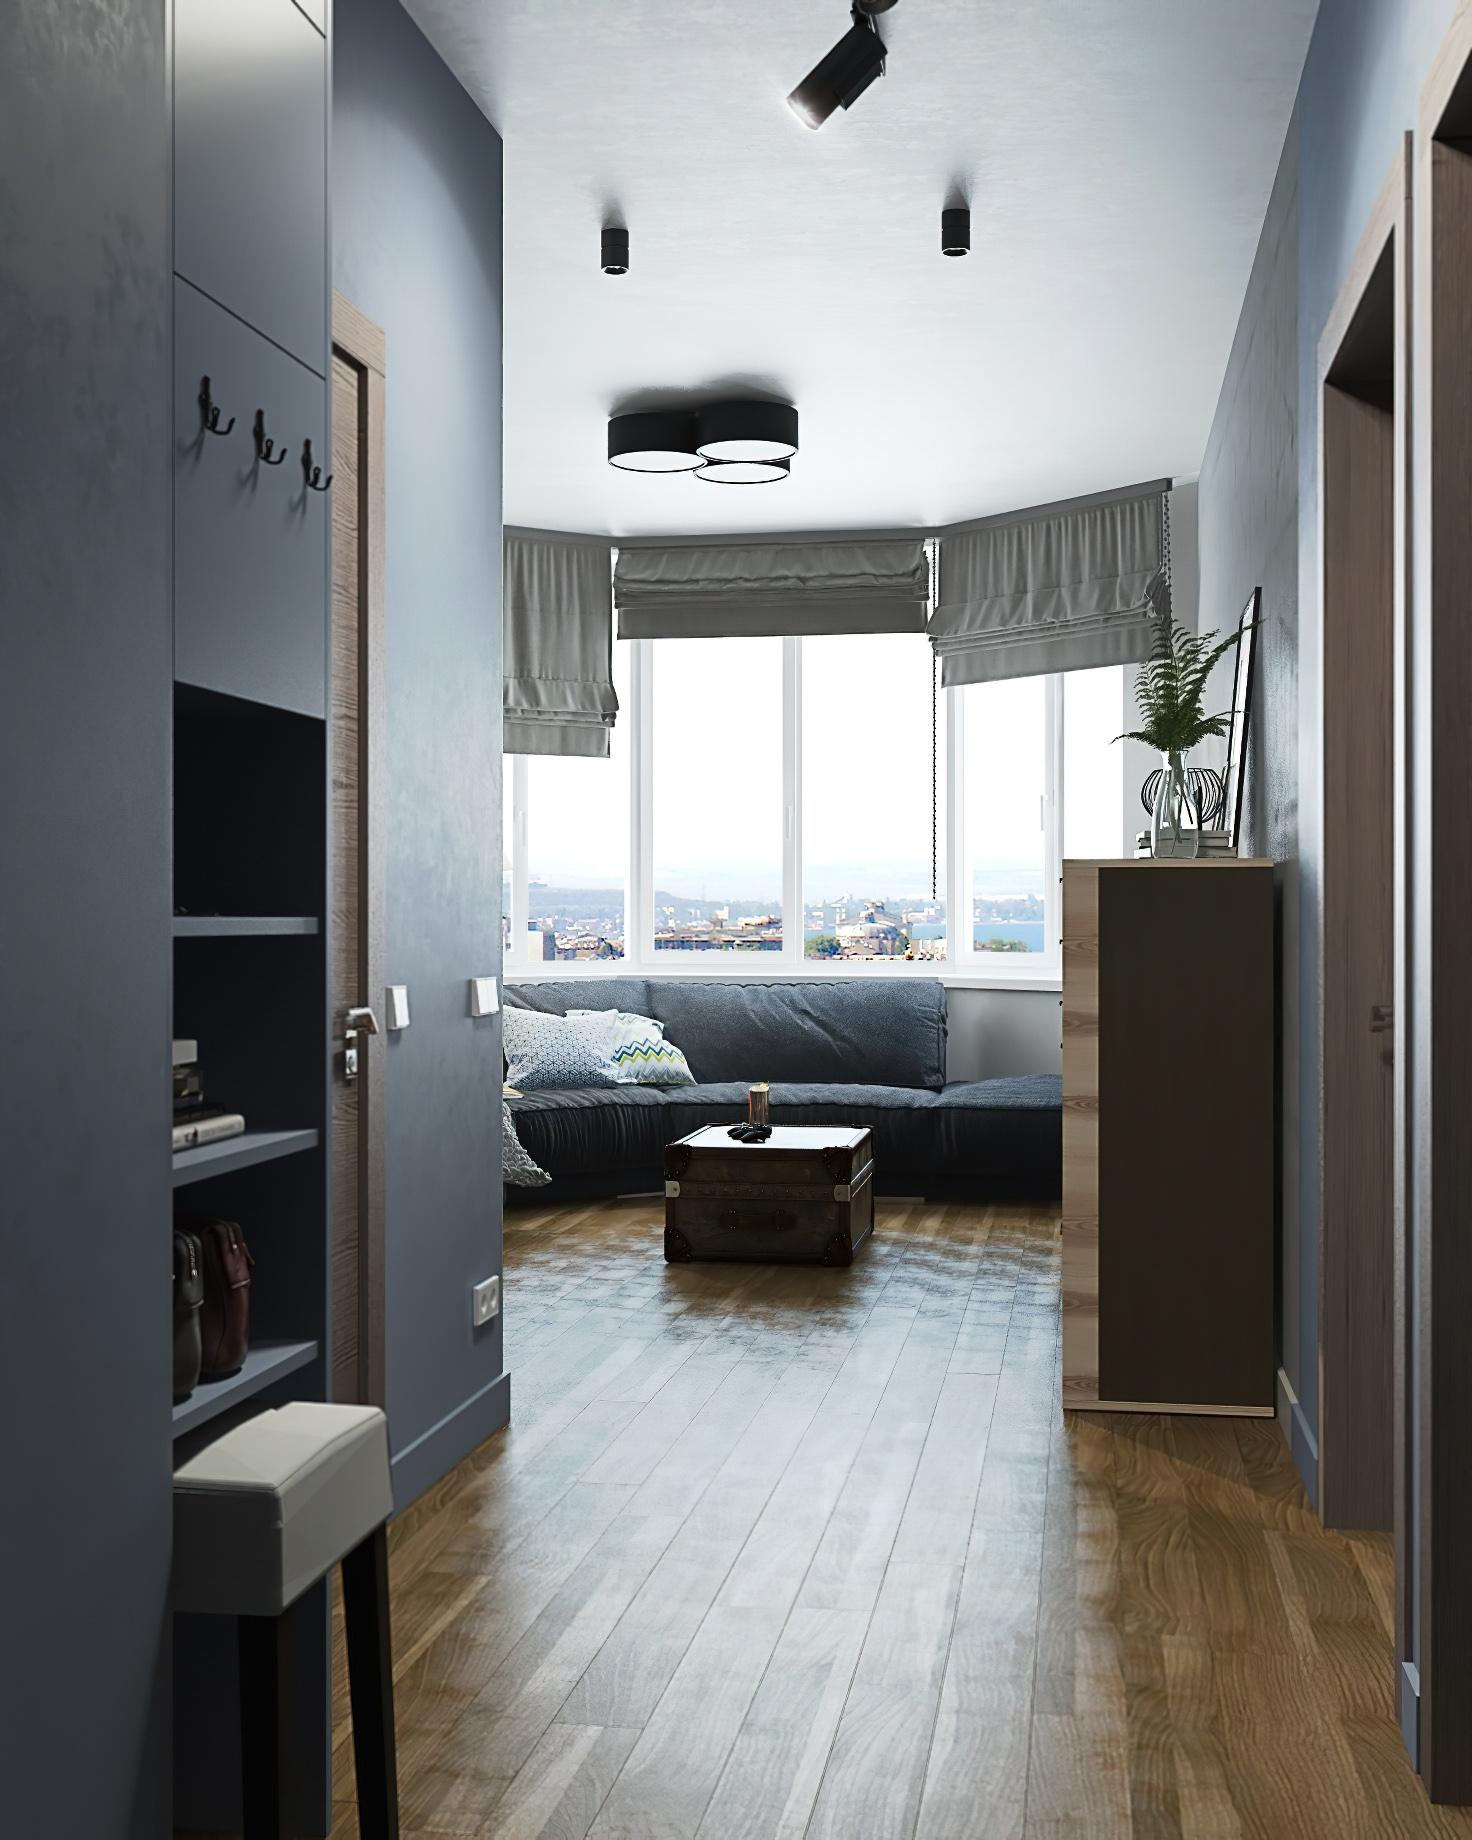 Sleepy Hollow K474 Apartment Interior Moscow, Russia - ETA Studio